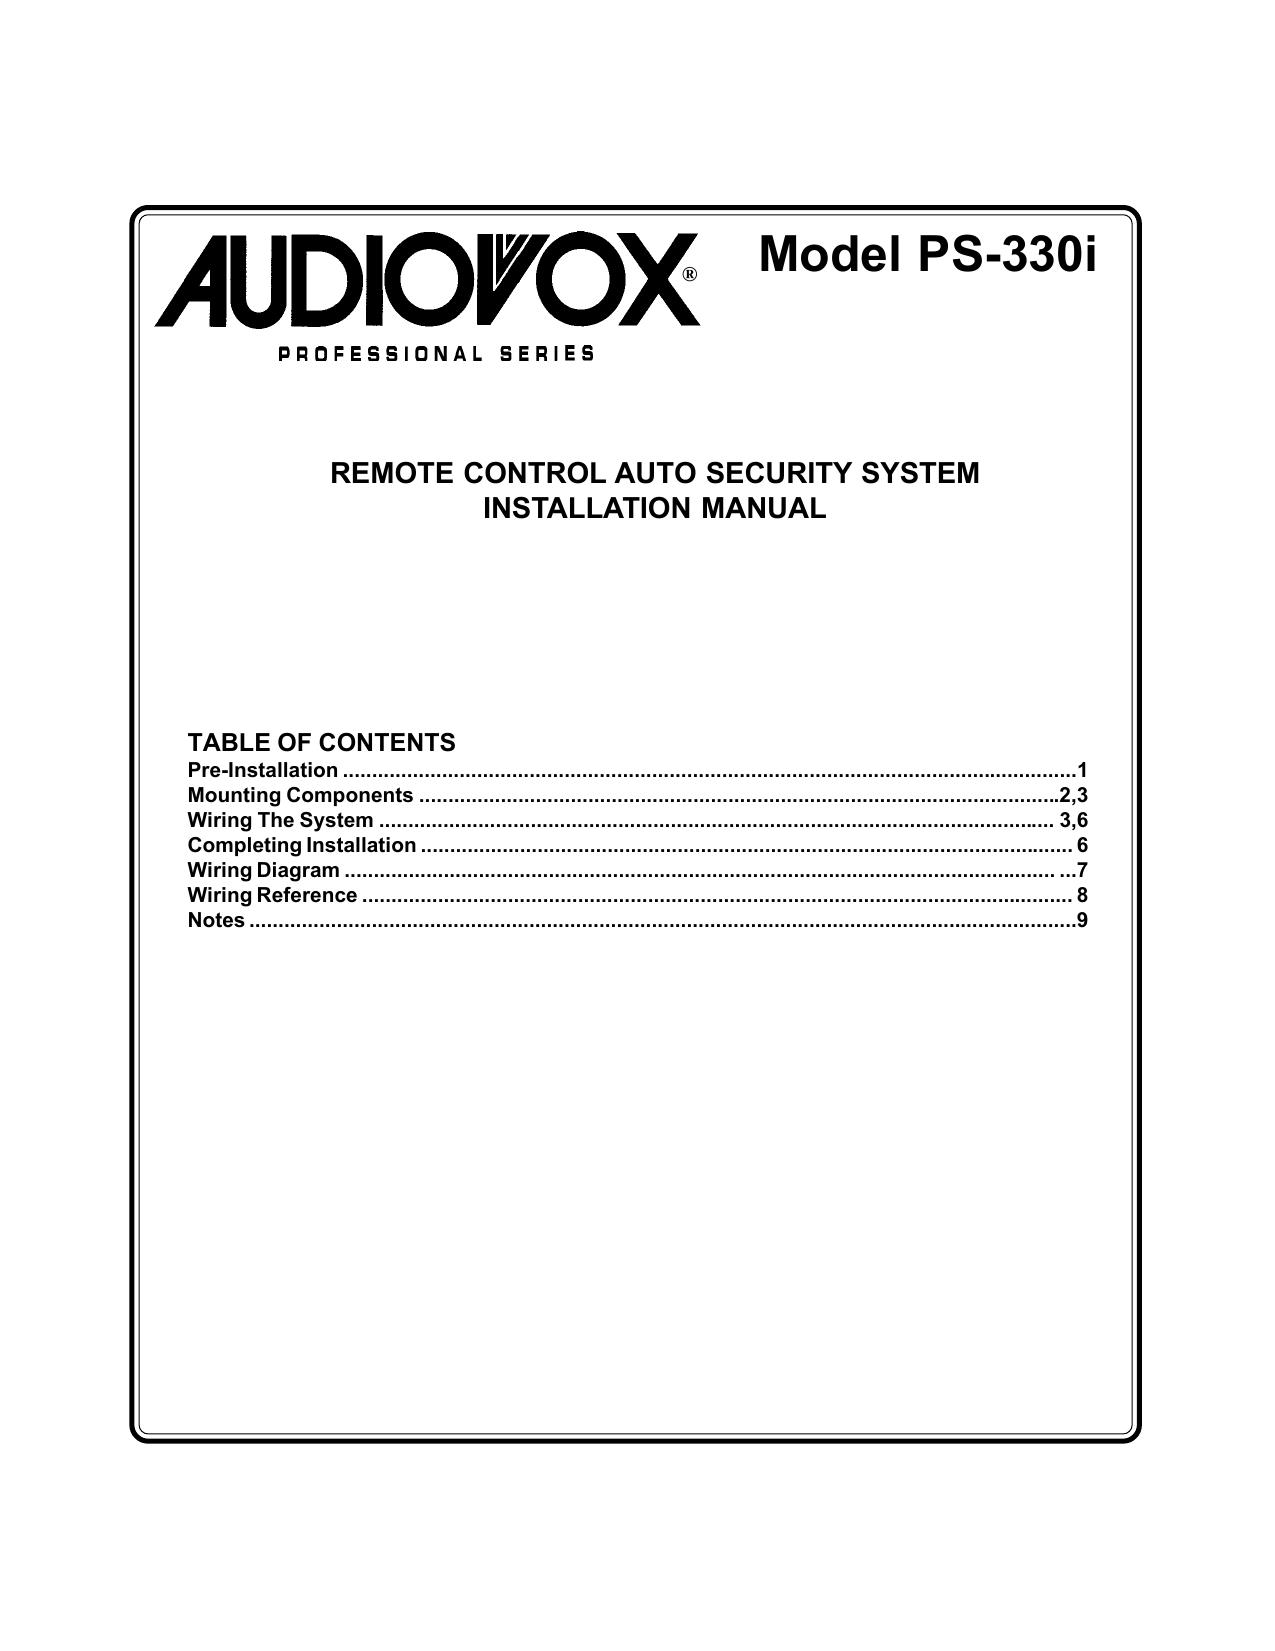 hight resolution of audiovox car alarm wiring diagram audiovox image audiovox alarm wiring diagram car audiovox image on audiovox